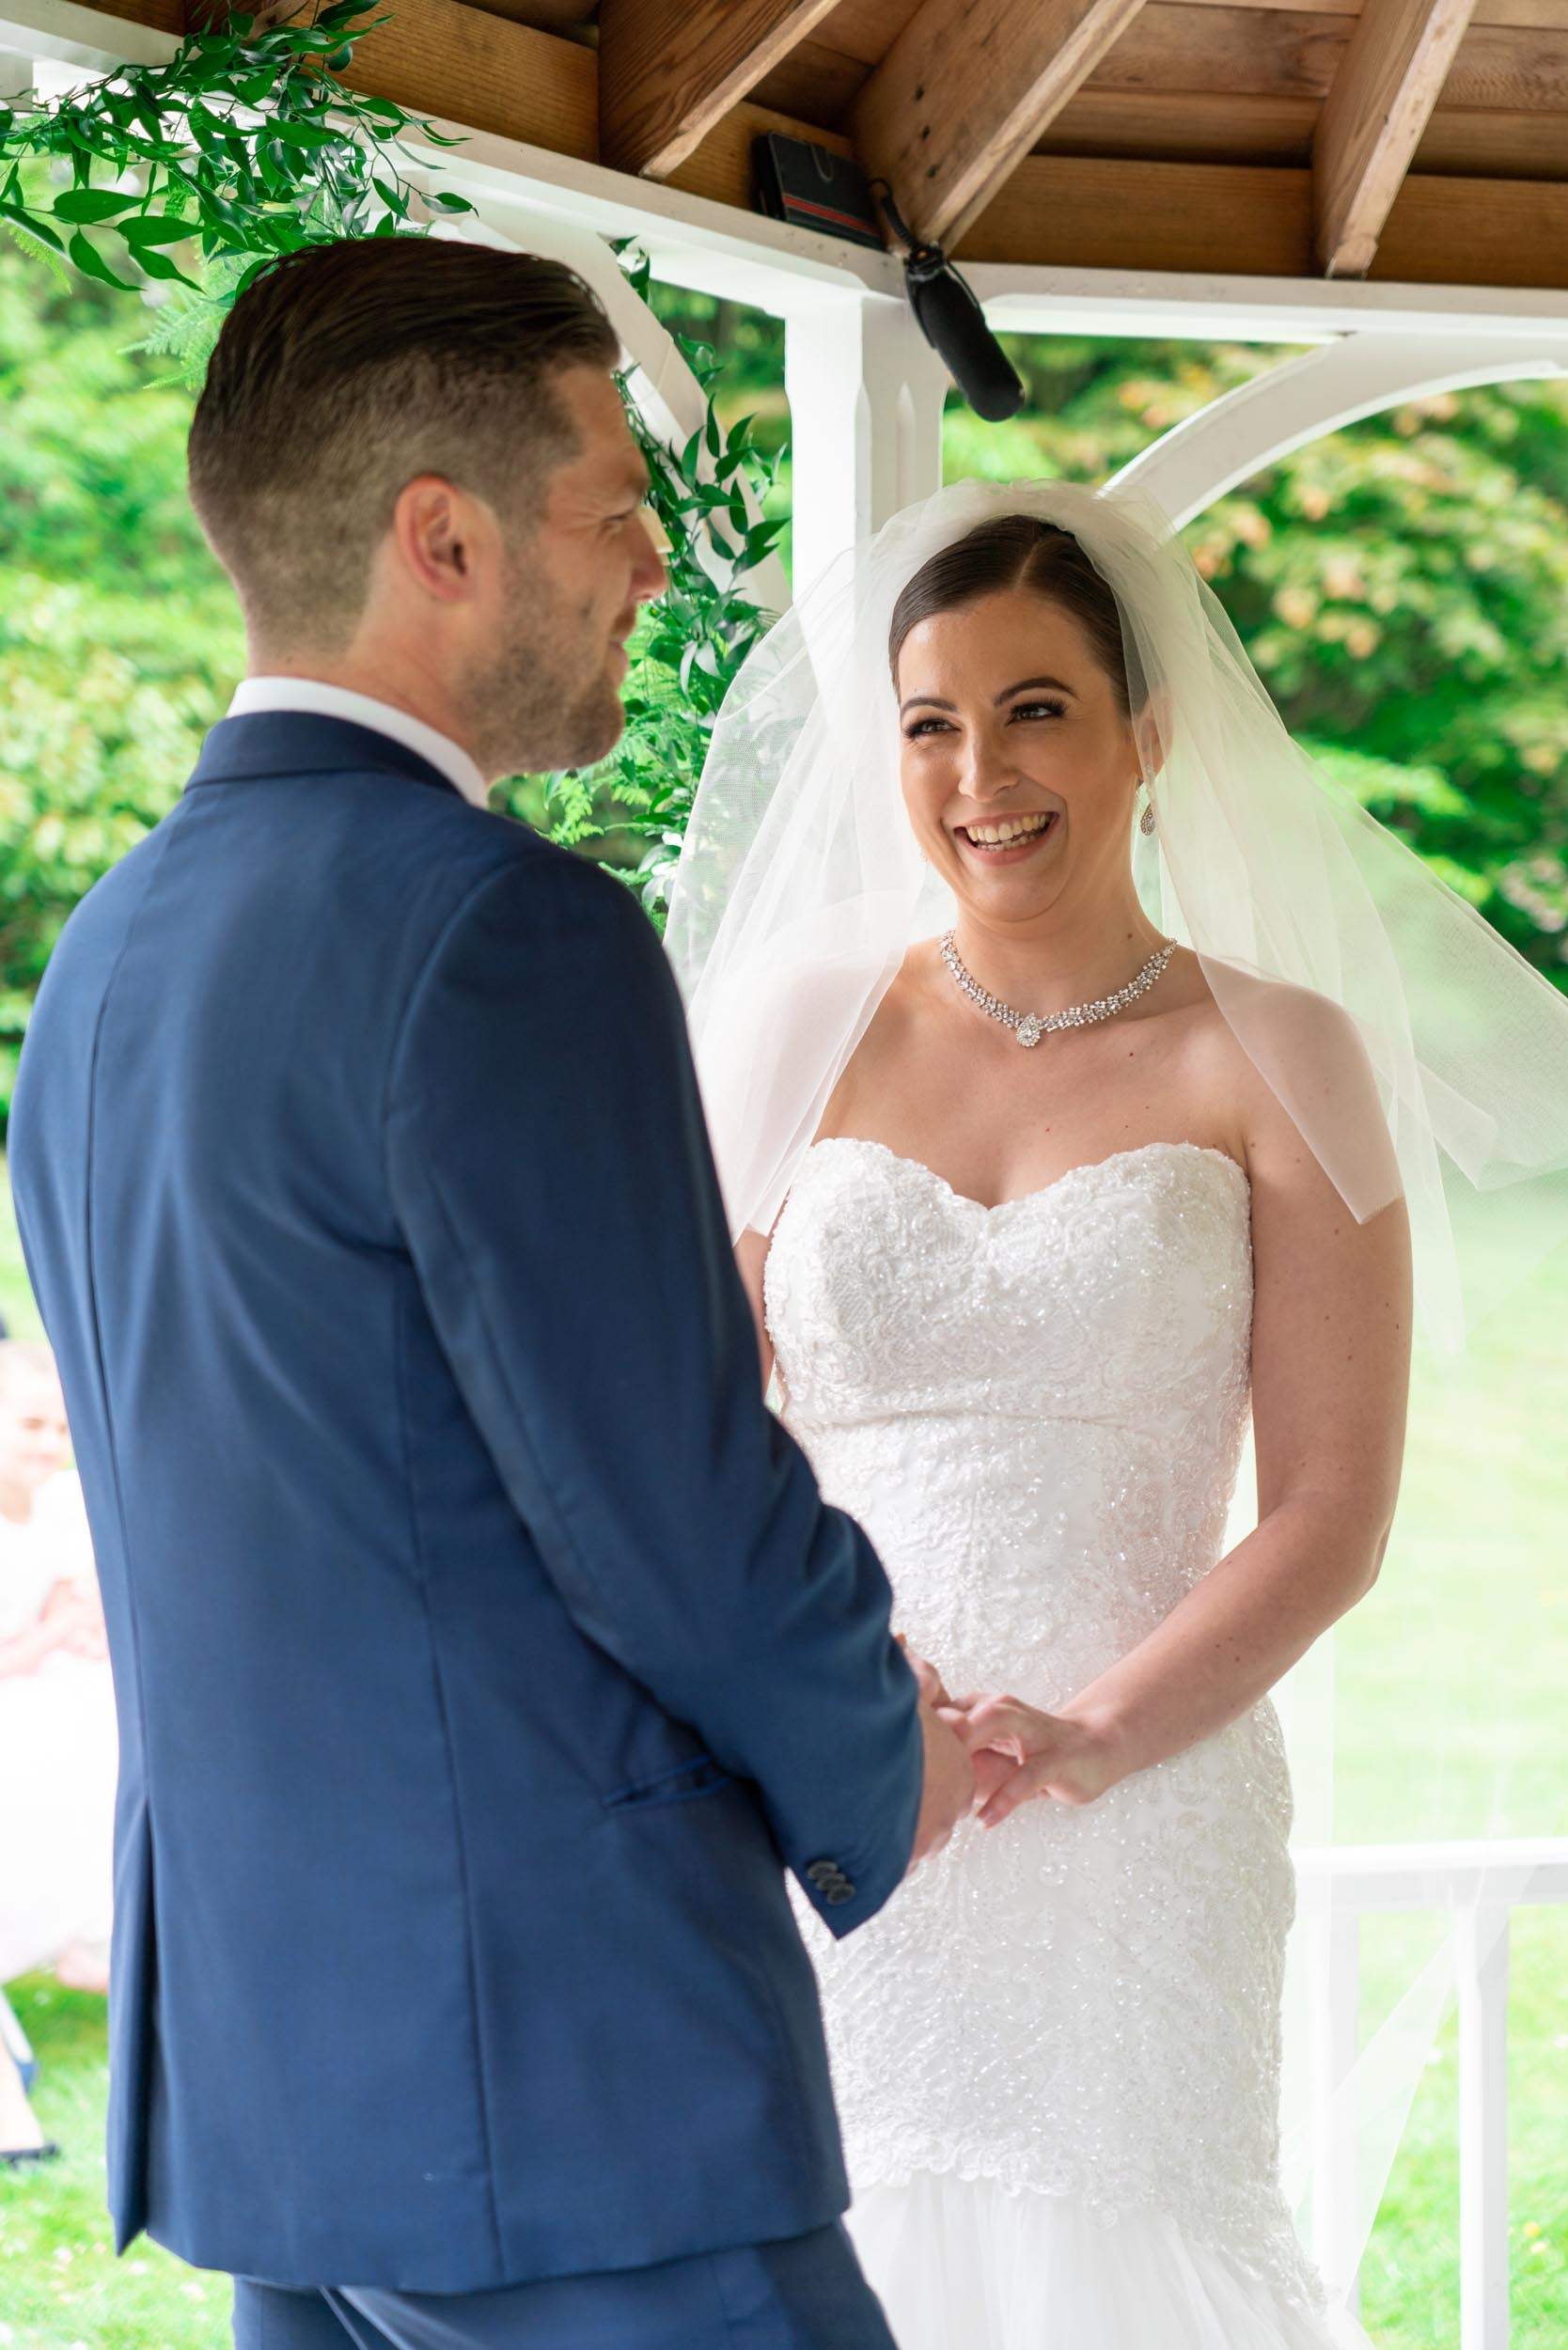 Wedding Ceremony Rowhill Grange 133.jpg